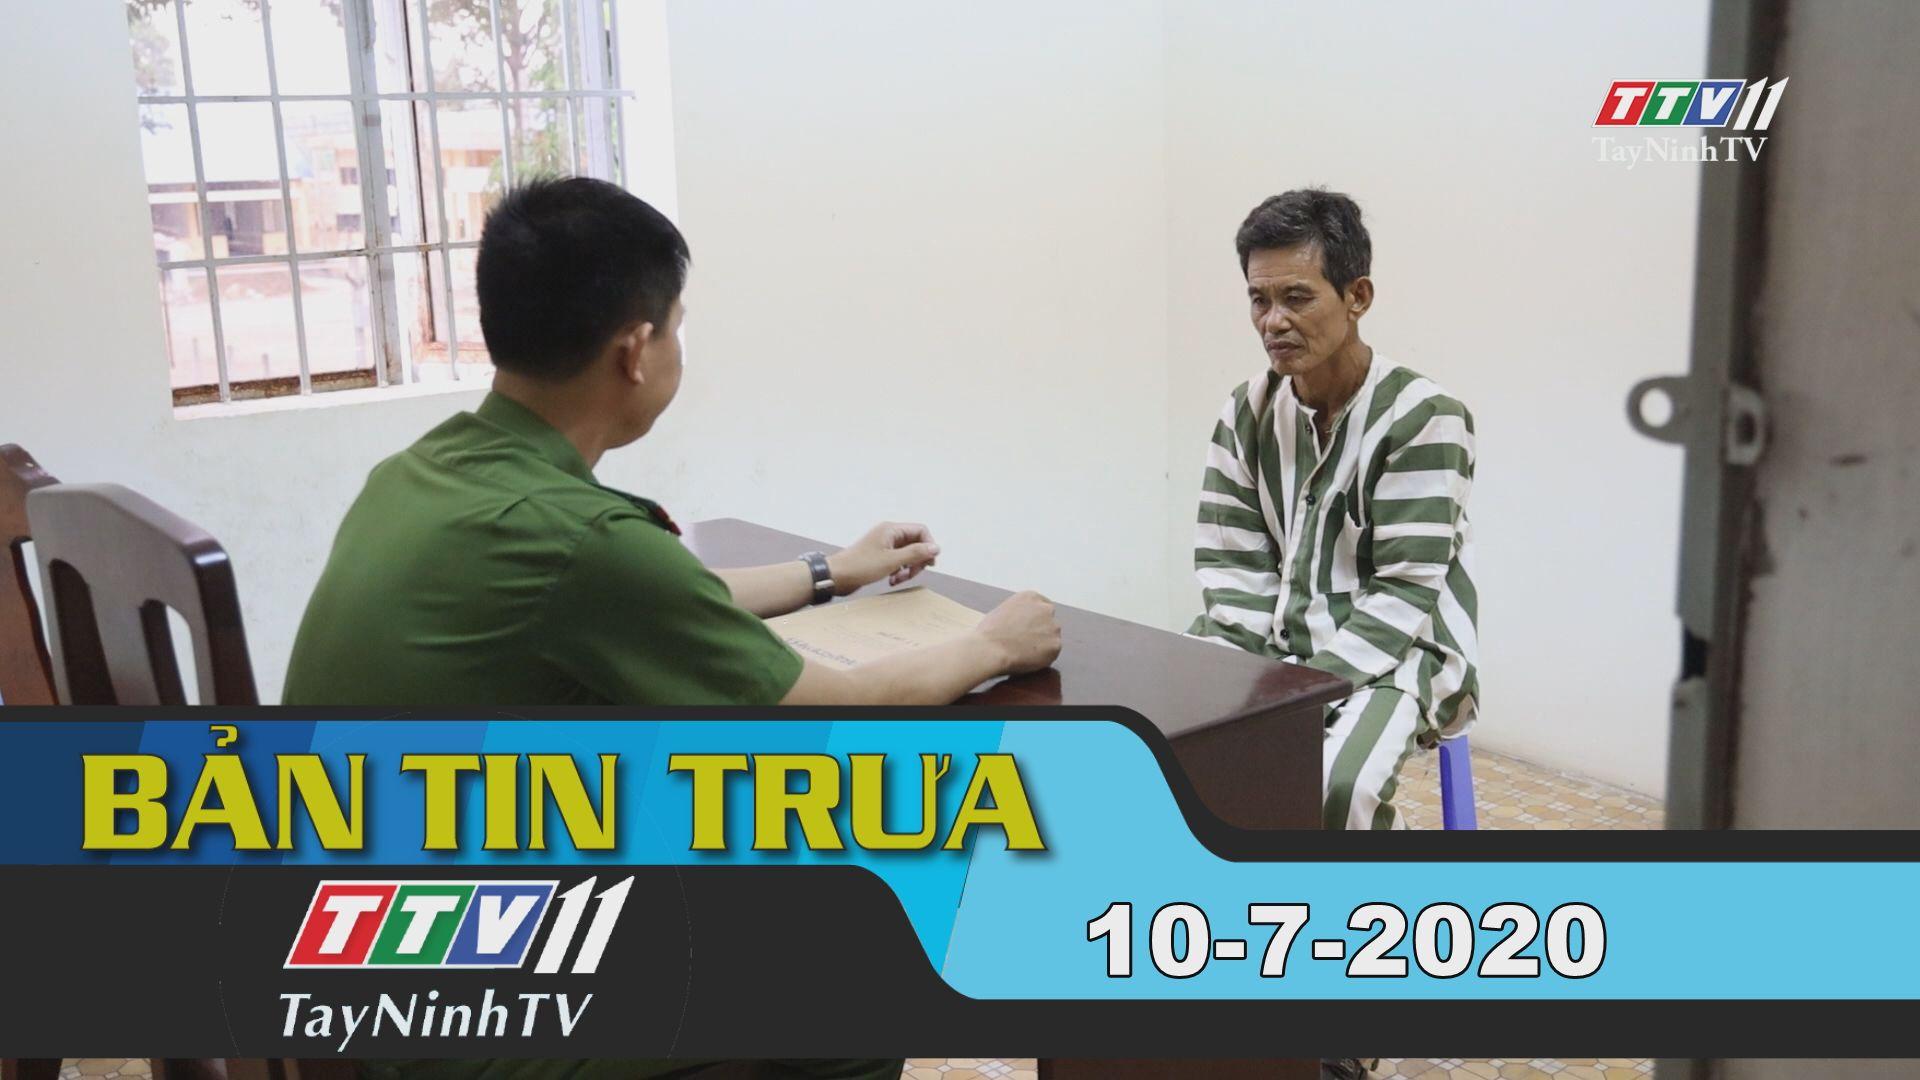 Bản tin trưa 10-7-2020 | Tin tức hôm nay | TayNinhTV